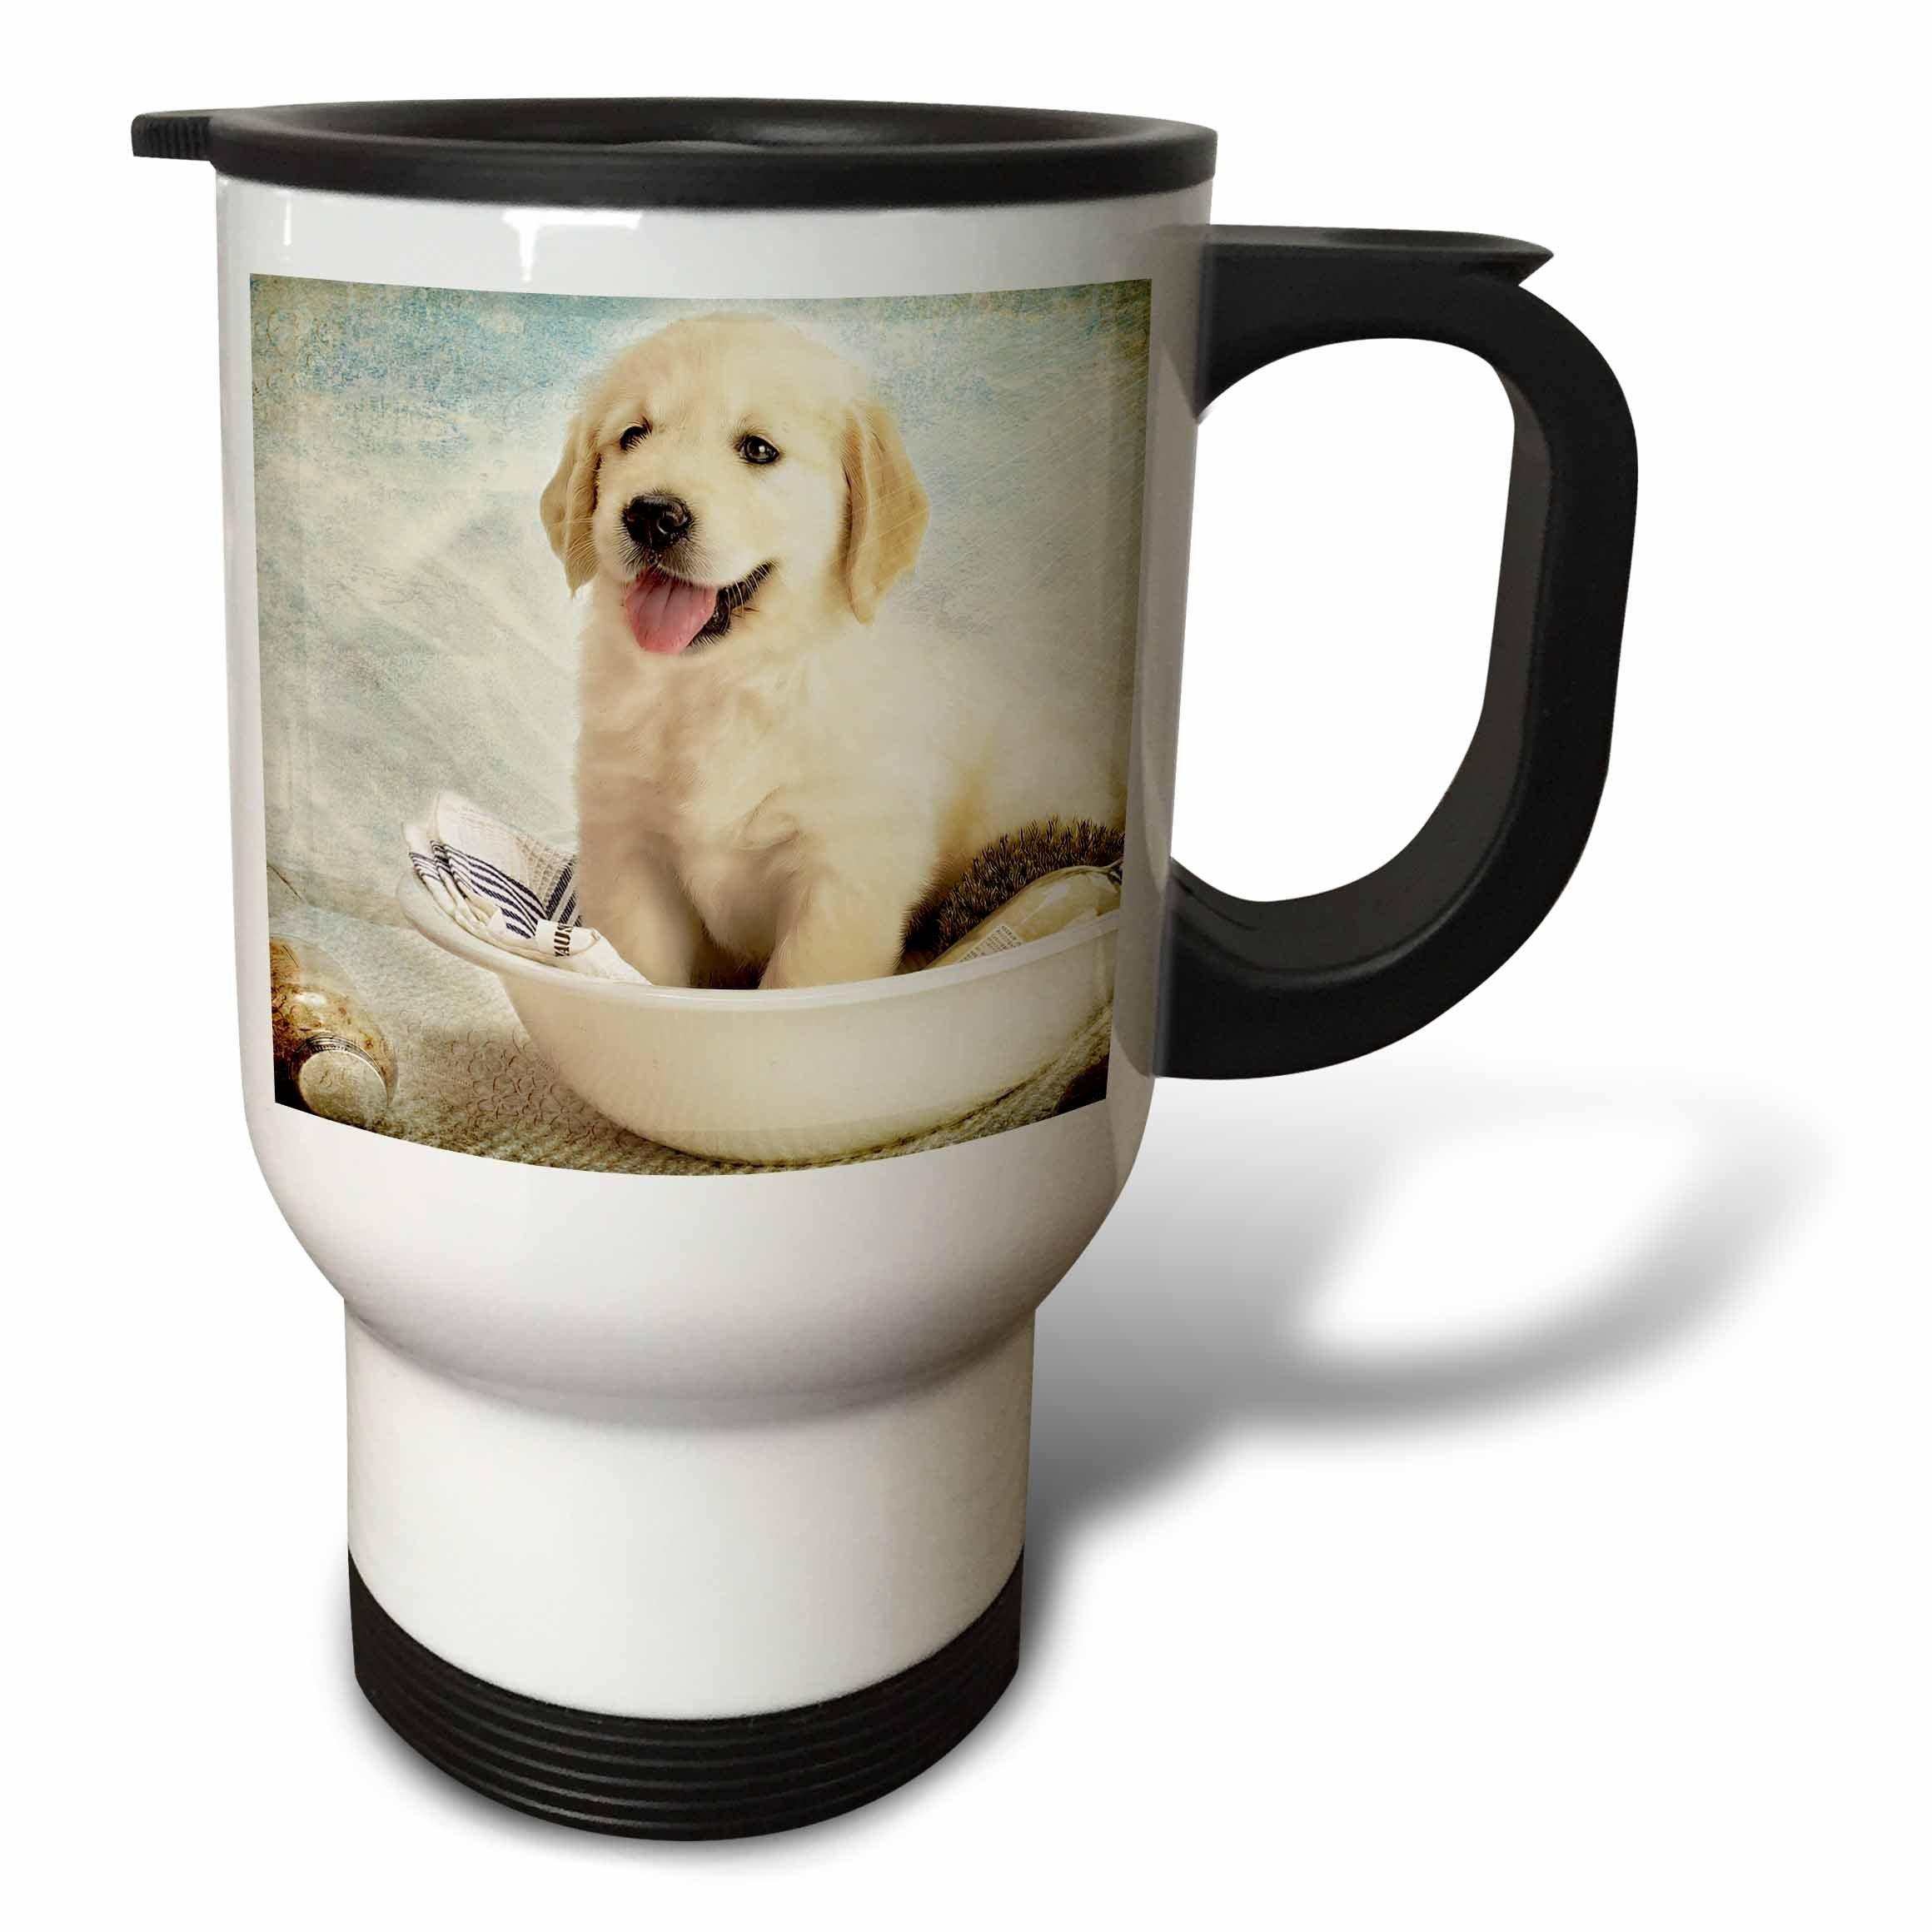 3dRose tm_172989_1'' Cute Golden Retriever Puppy Spa Day Art Photo Courtesy Badest Boss Stainless Steel Travel Mug, 14 oz, Multicolor